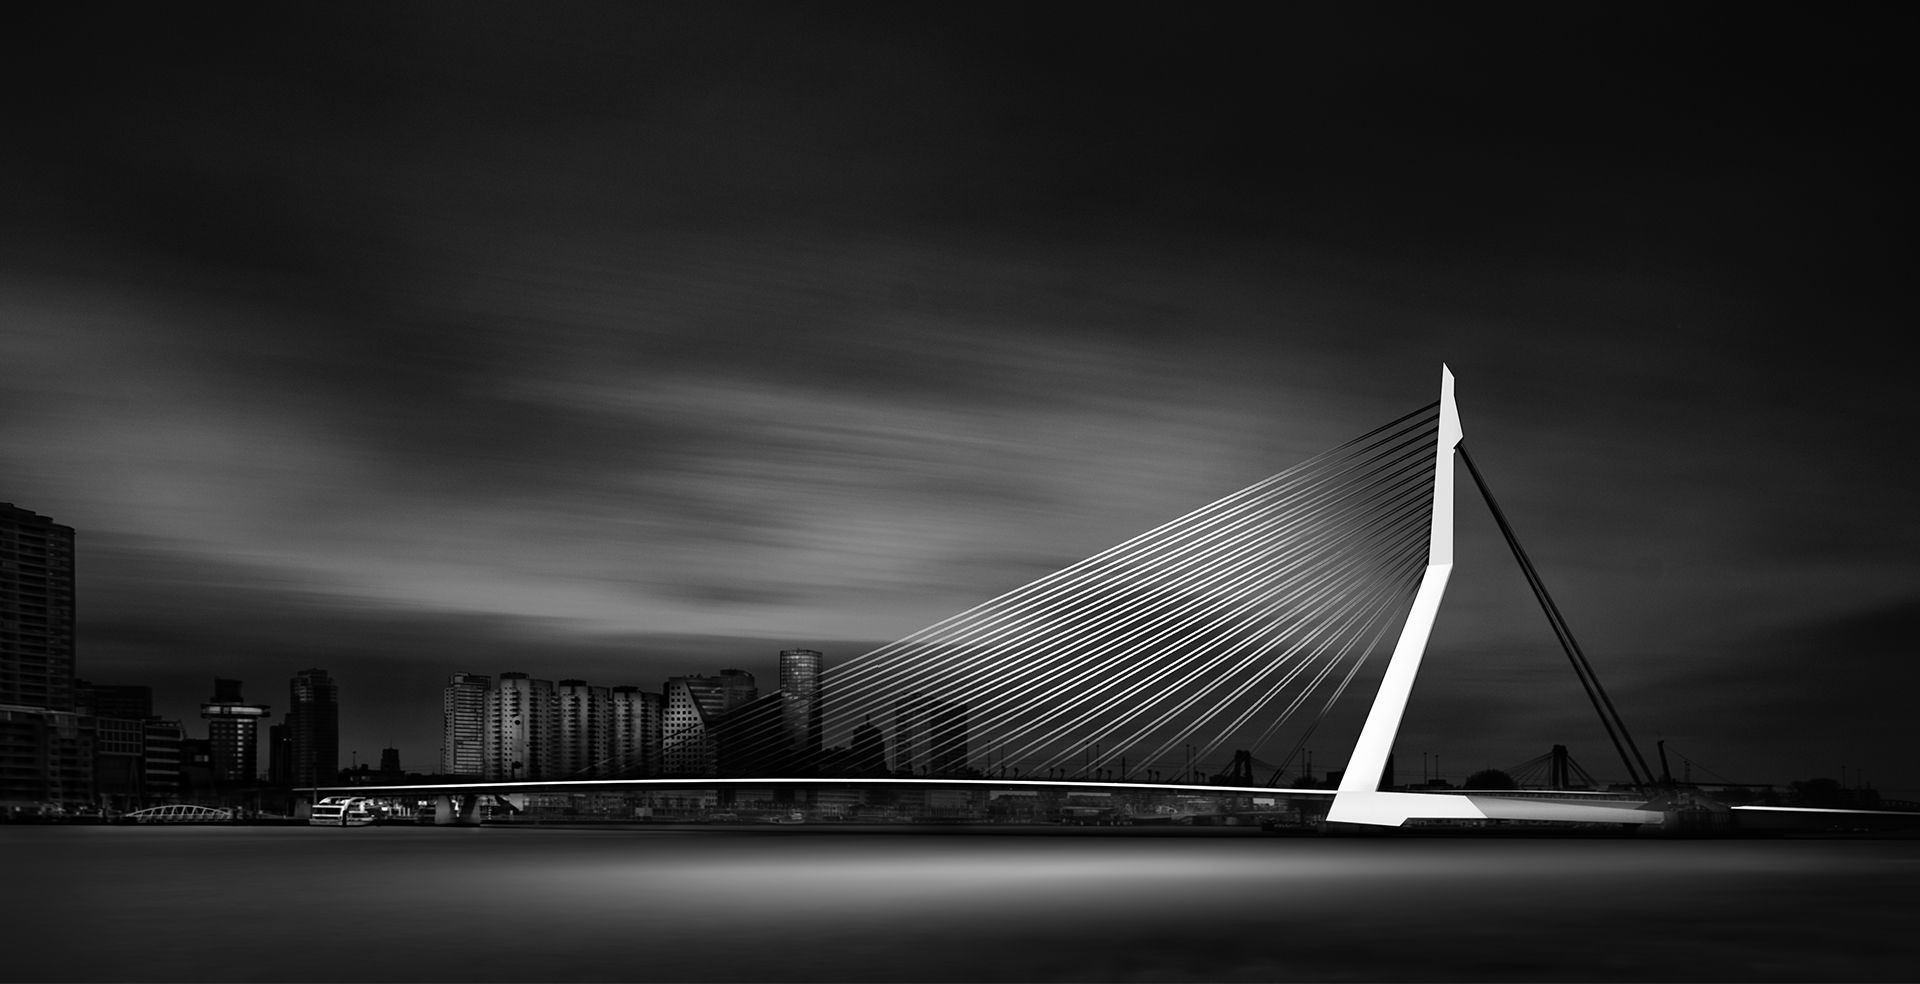 Timeless bridge